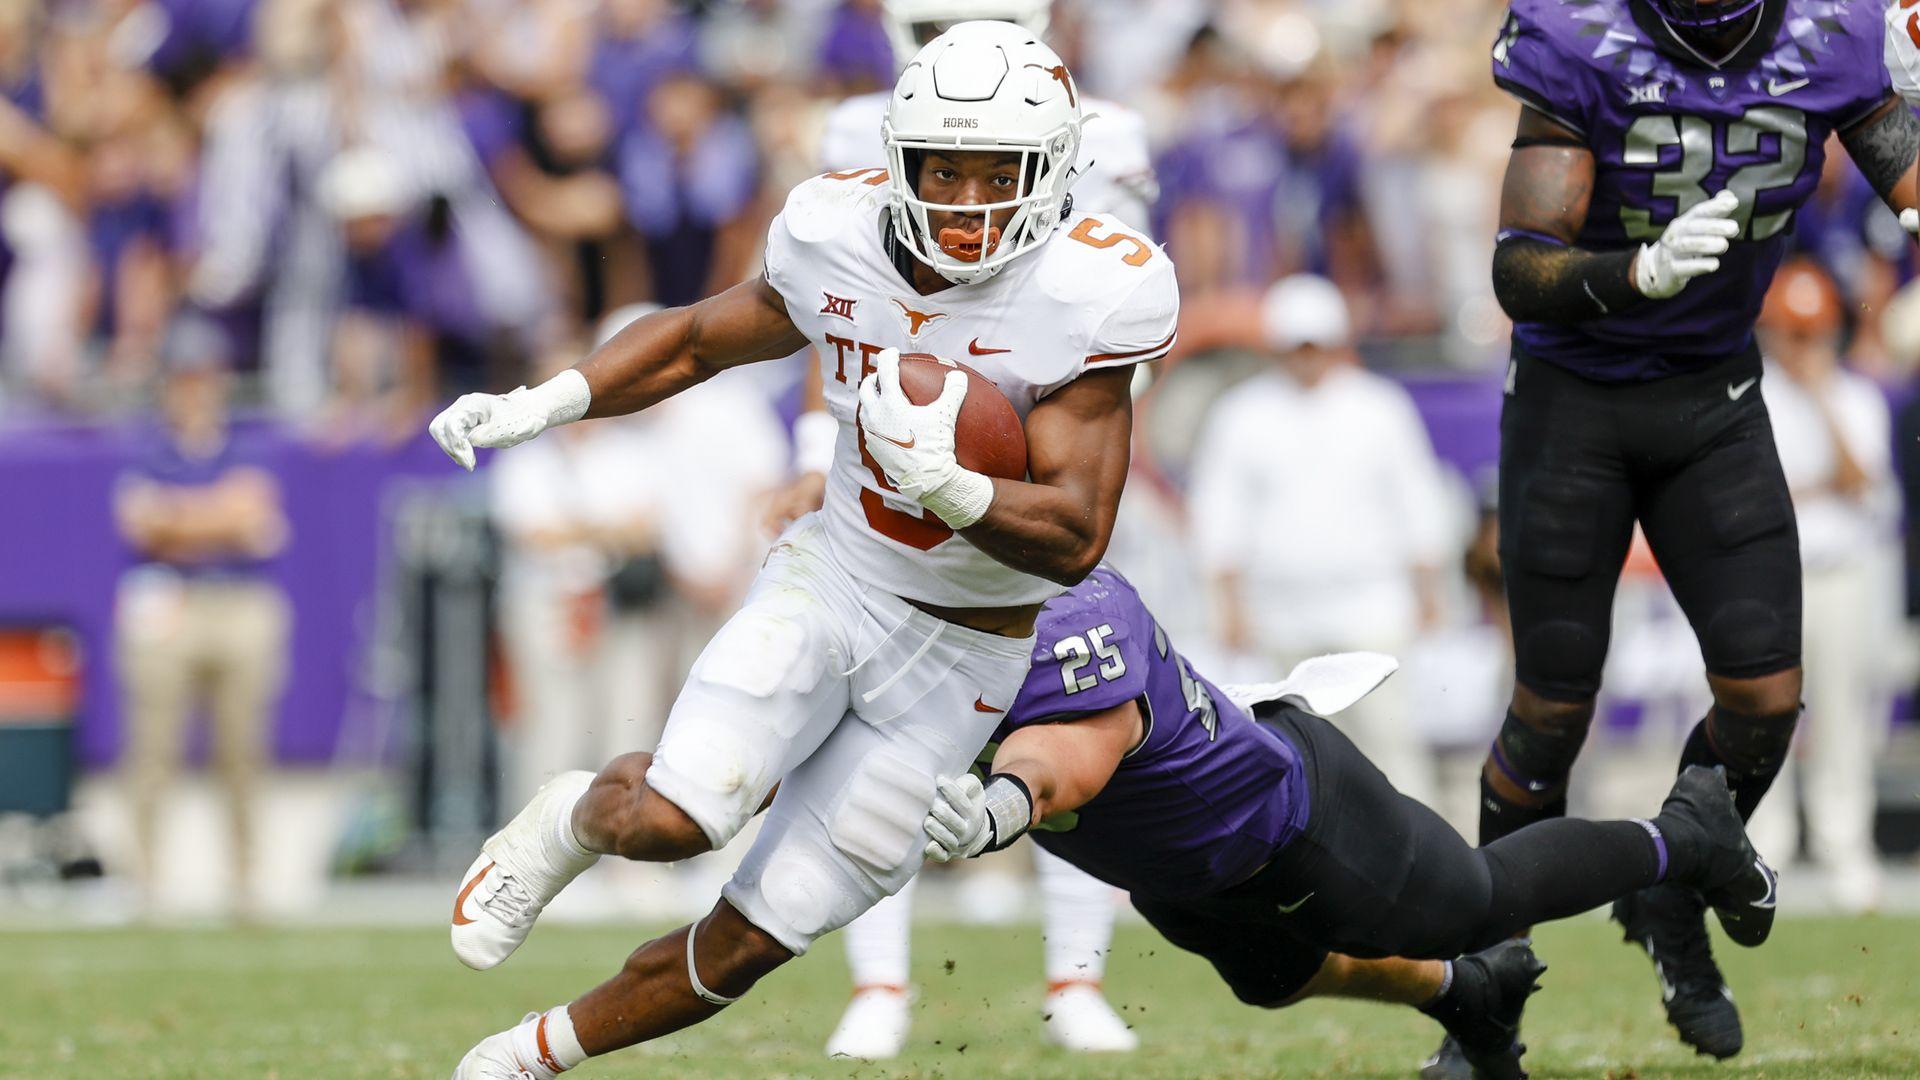 University of Texas running back Bijan Robinson eludes a tackler.